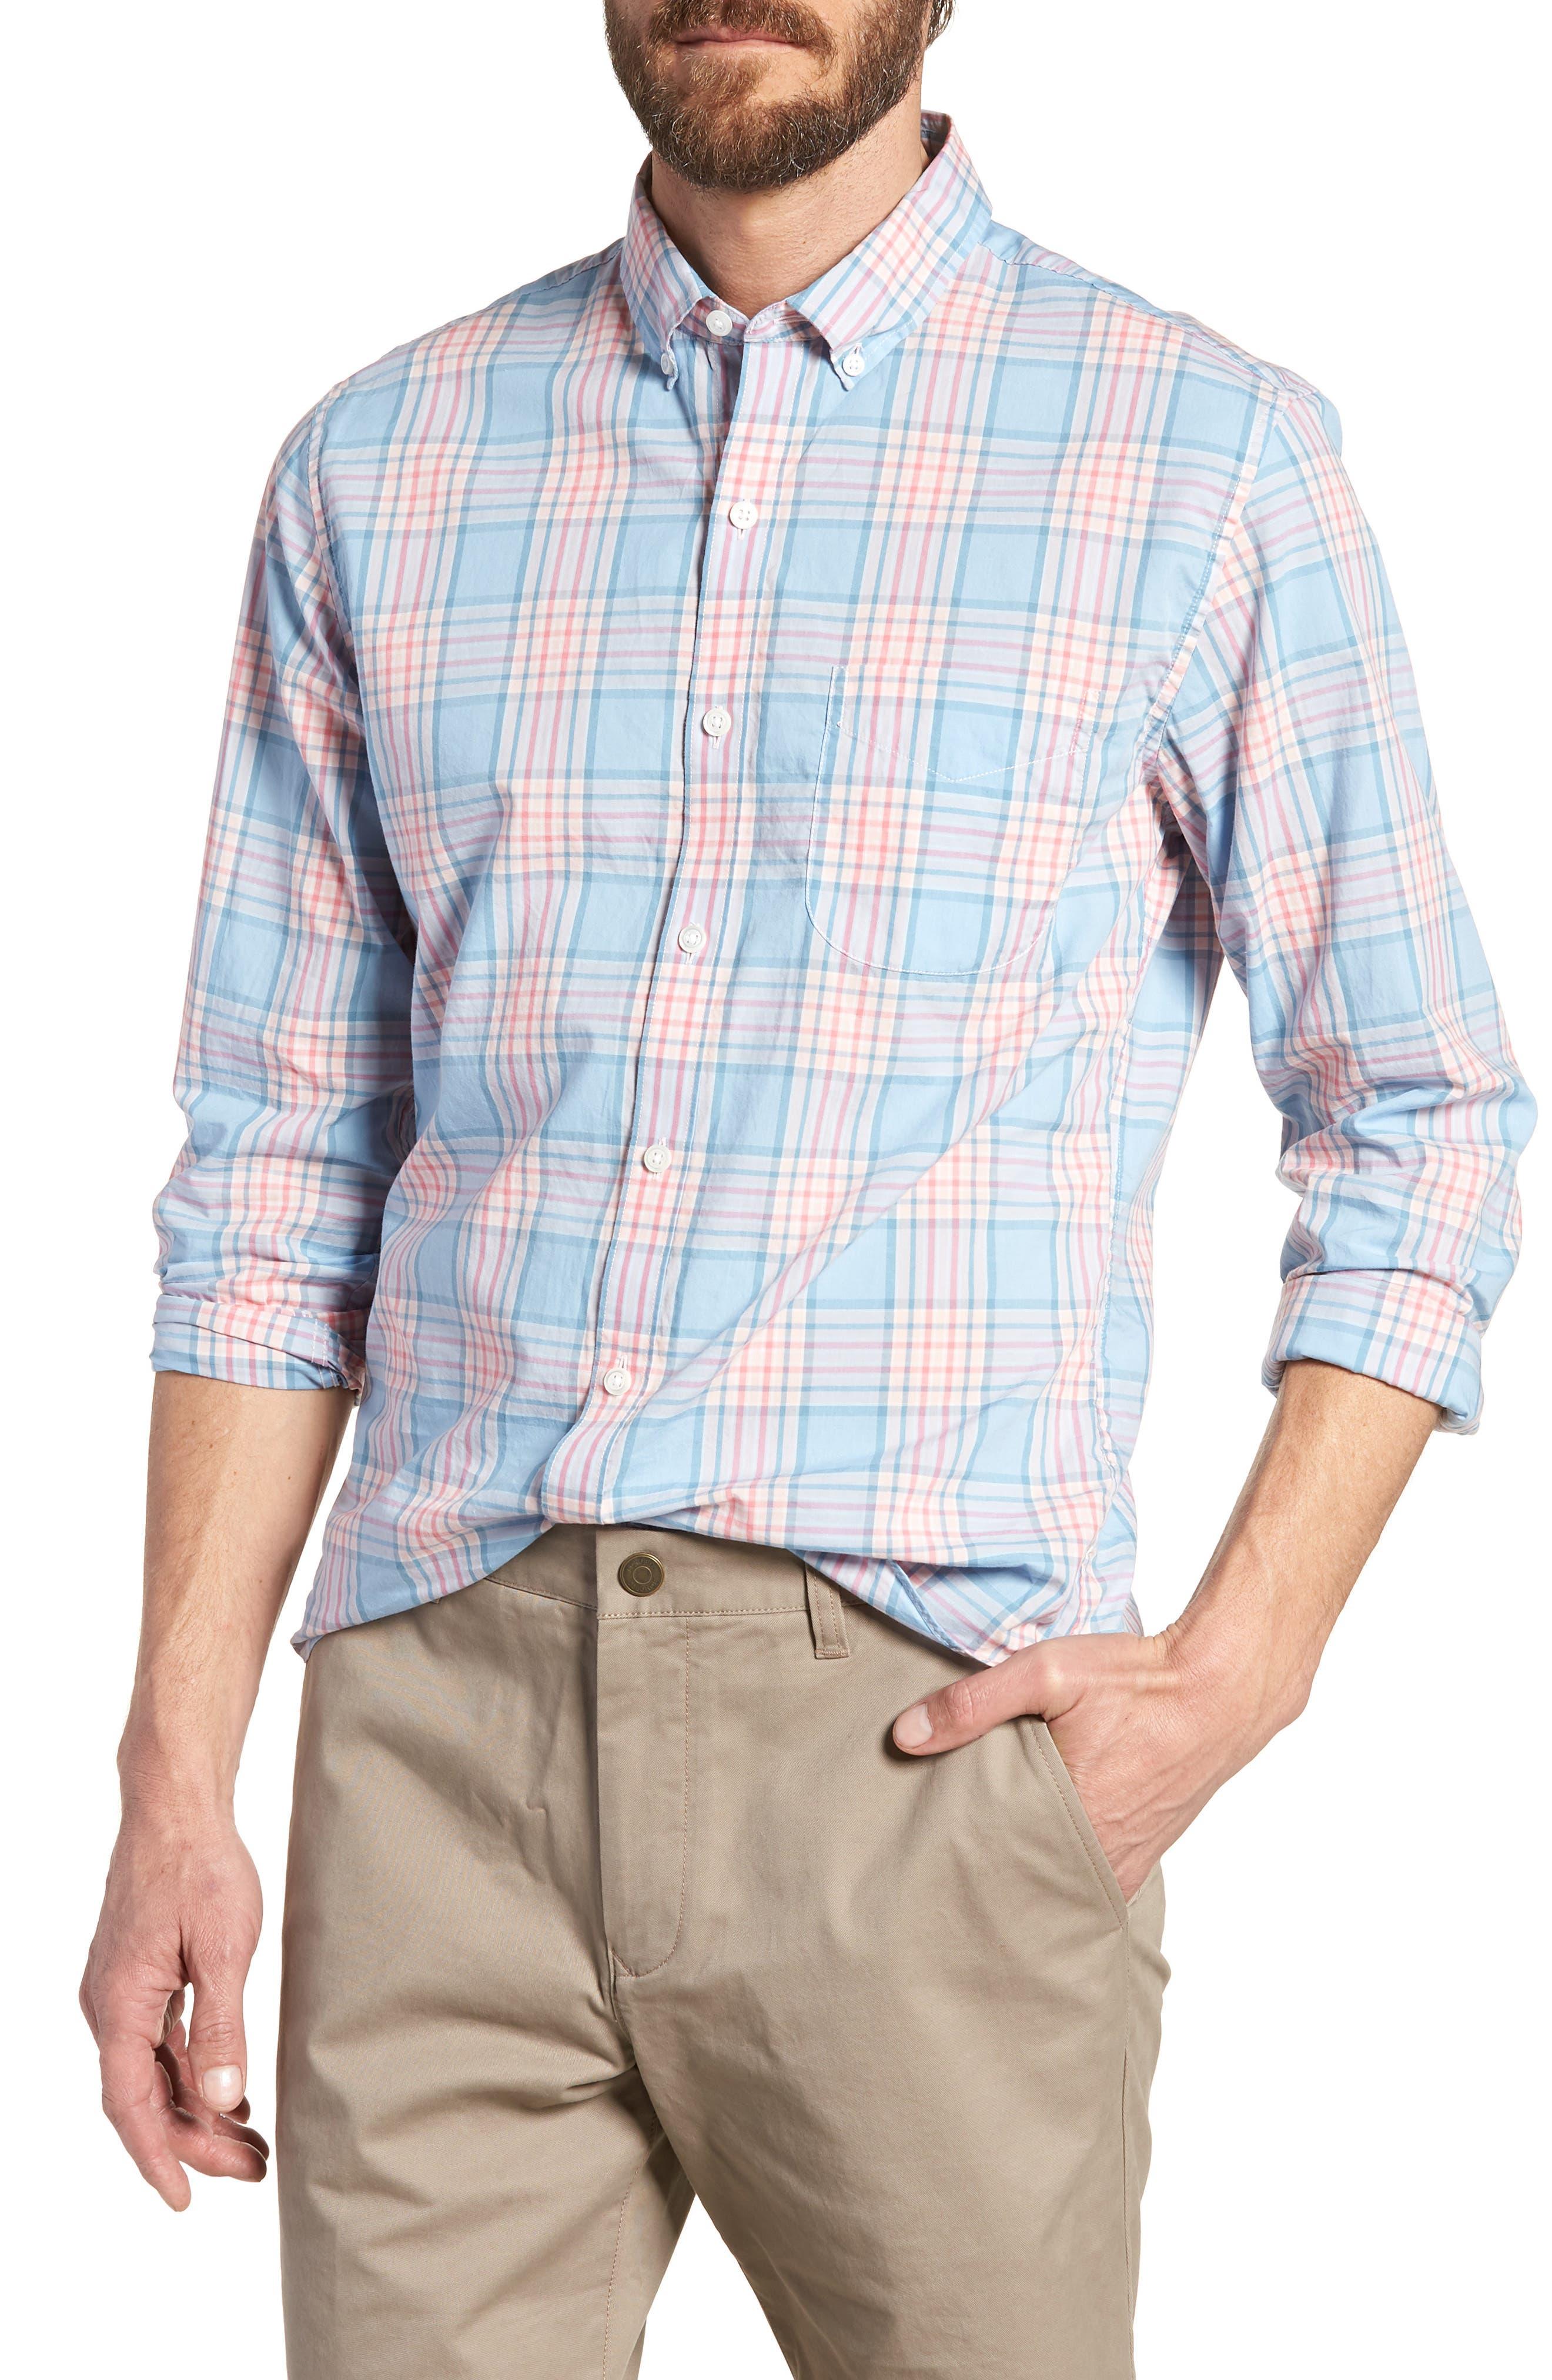 Slim Fit Plaid Sport Shirt,                             Main thumbnail 1, color,                             Sandoval Plaid - Peach Melba